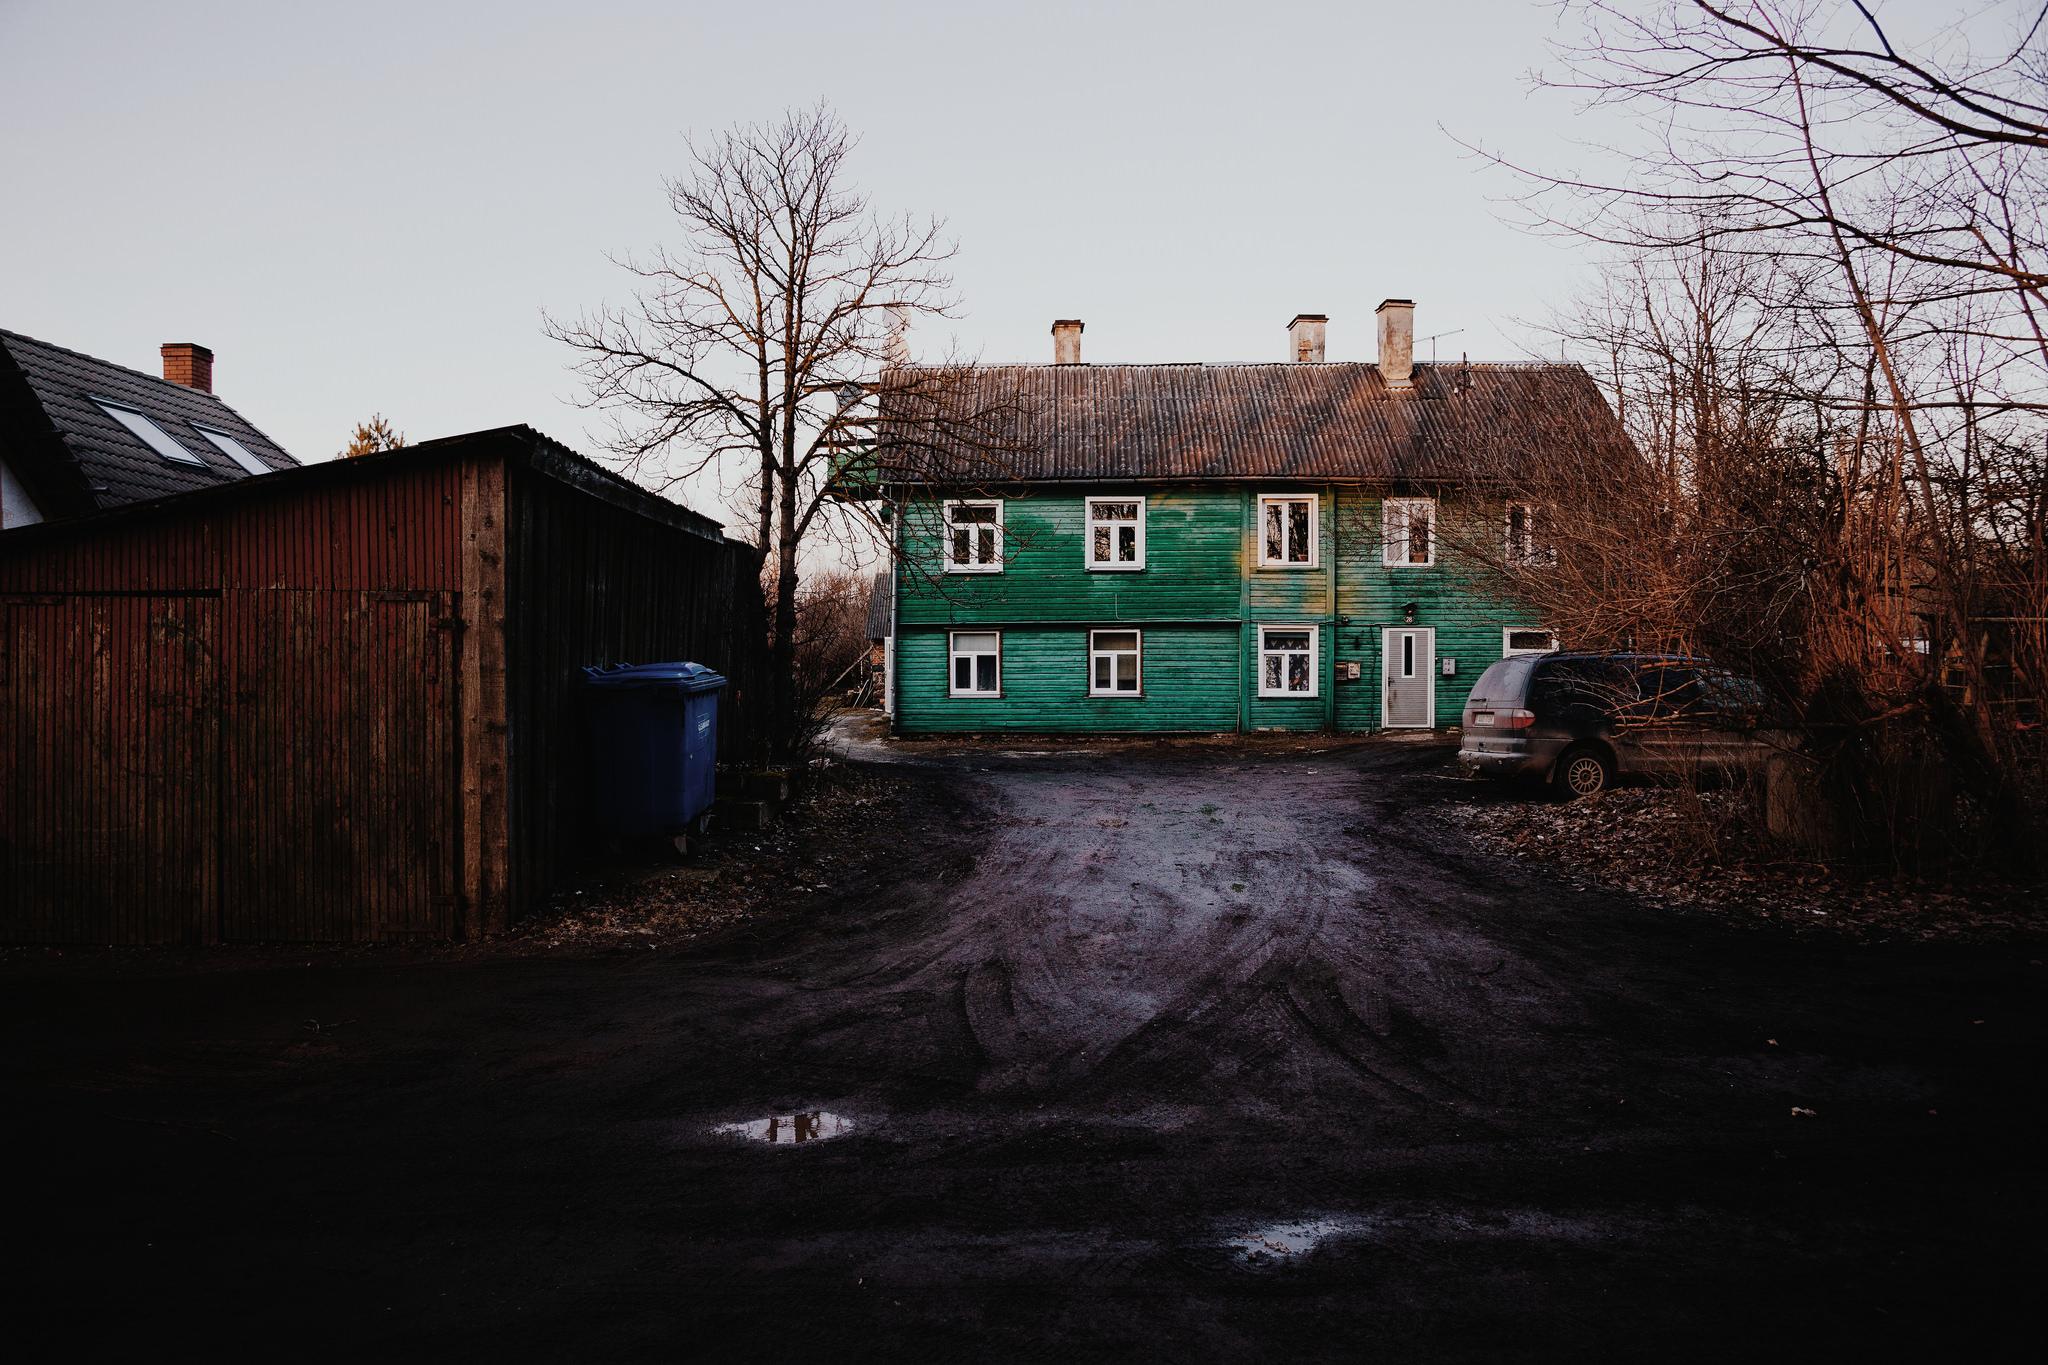 Ülejõe, Tartu, Estonia. March 2015.